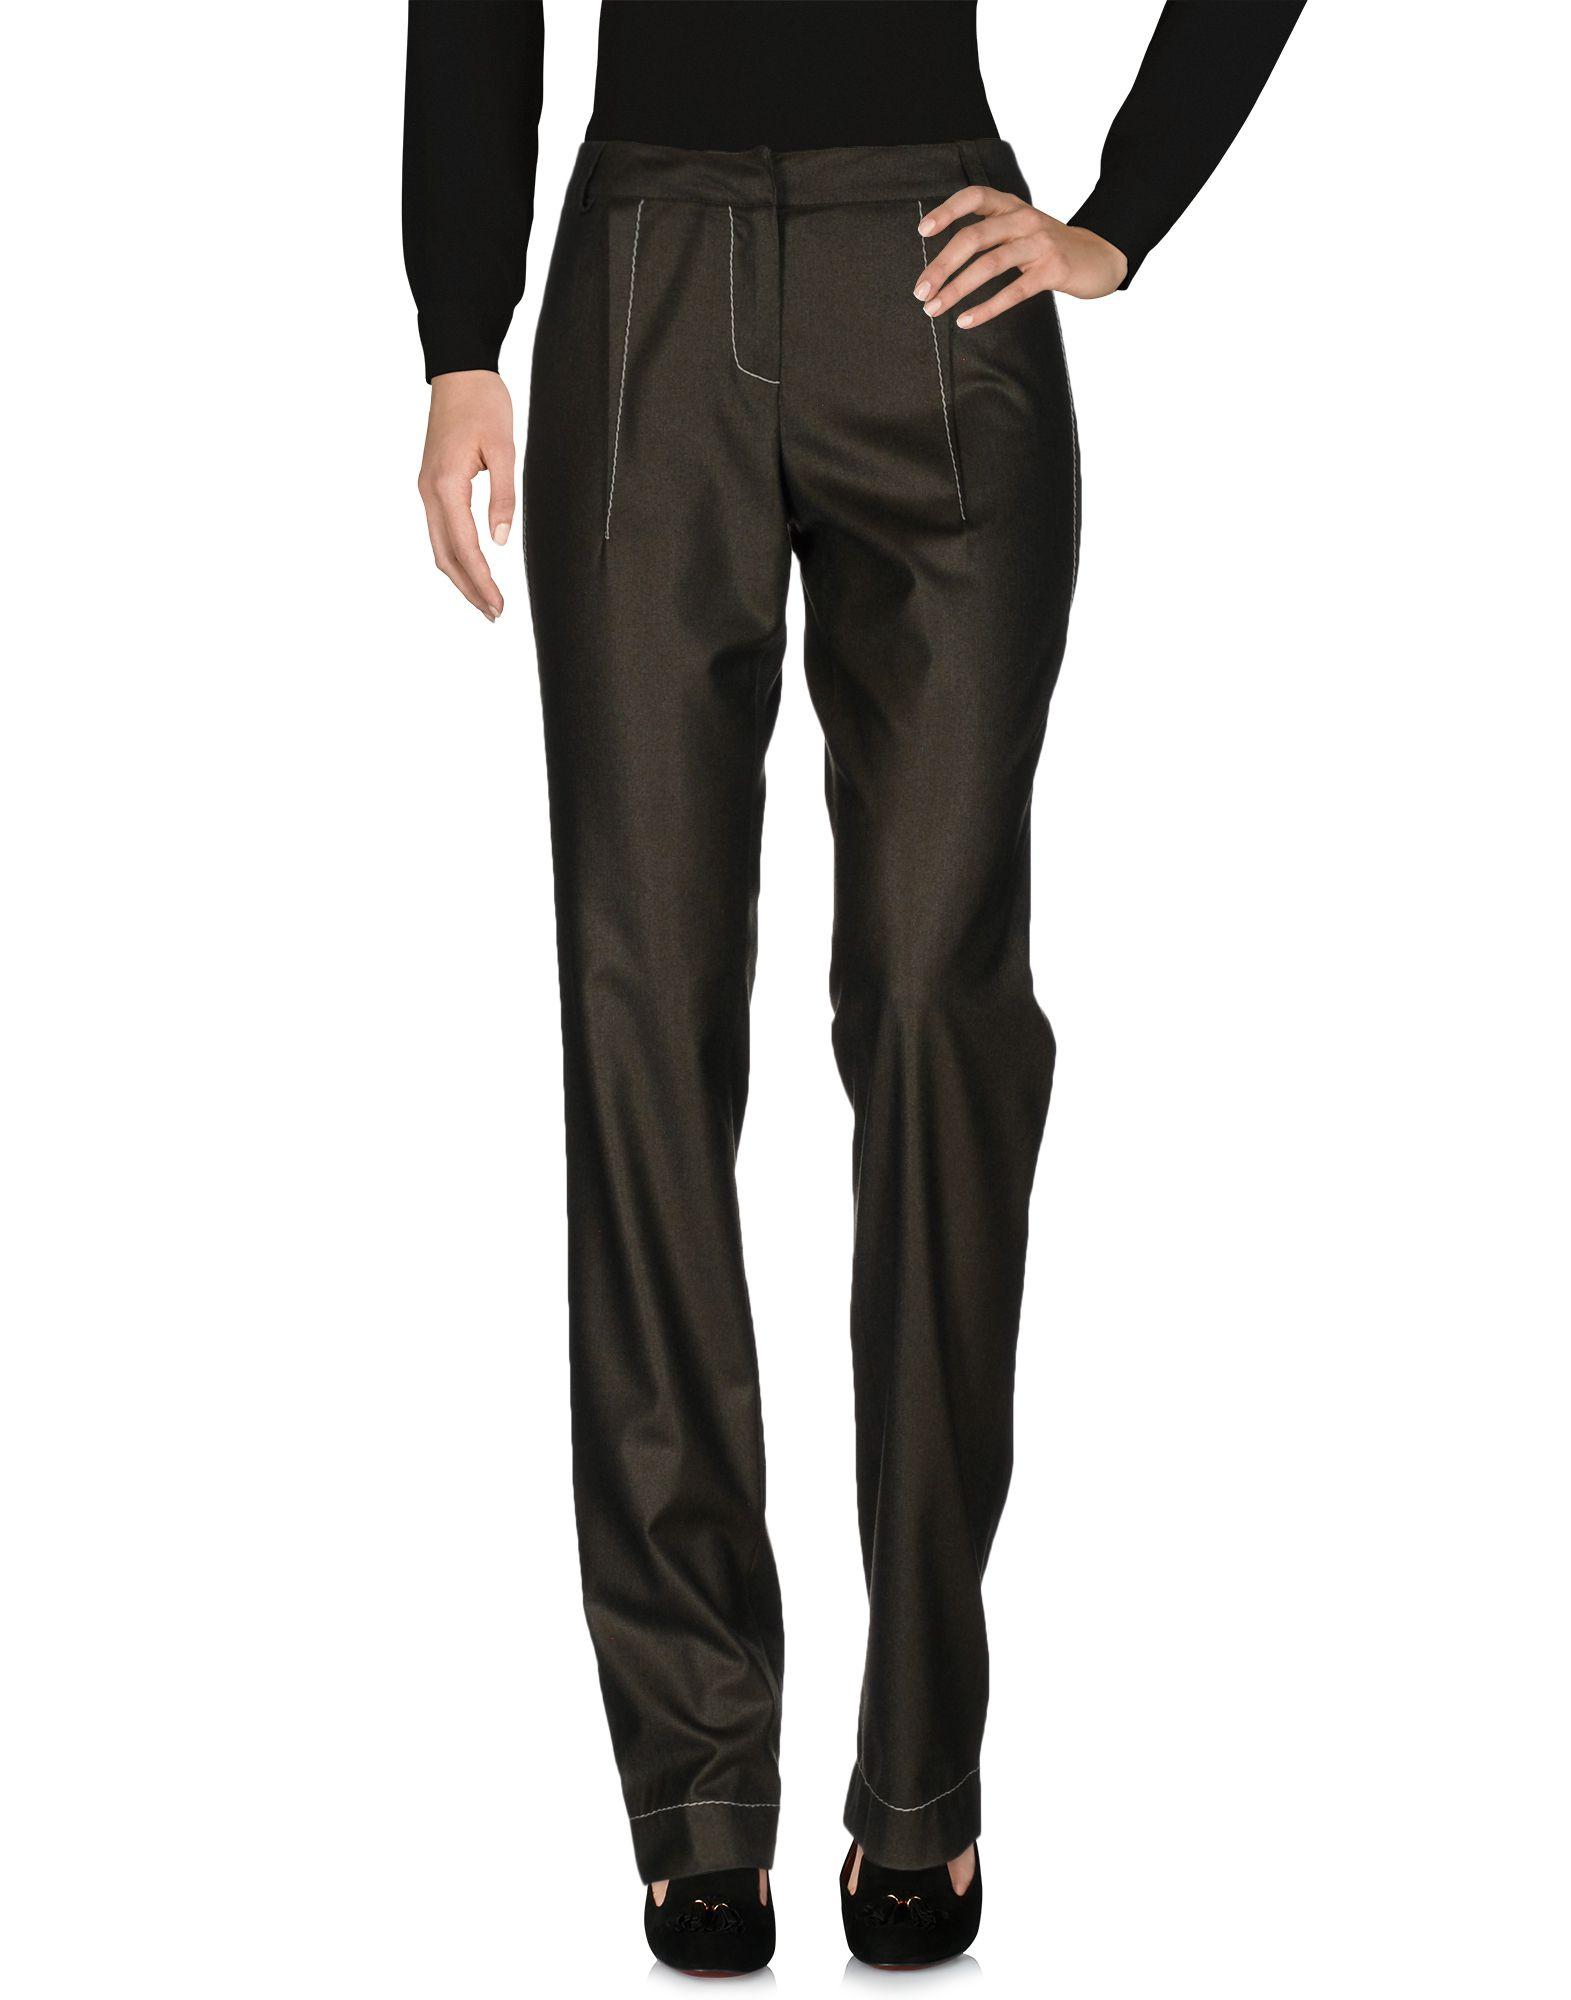 Pantalone Christian Dior Boutique Donna - Acquista online su xuLflFbi